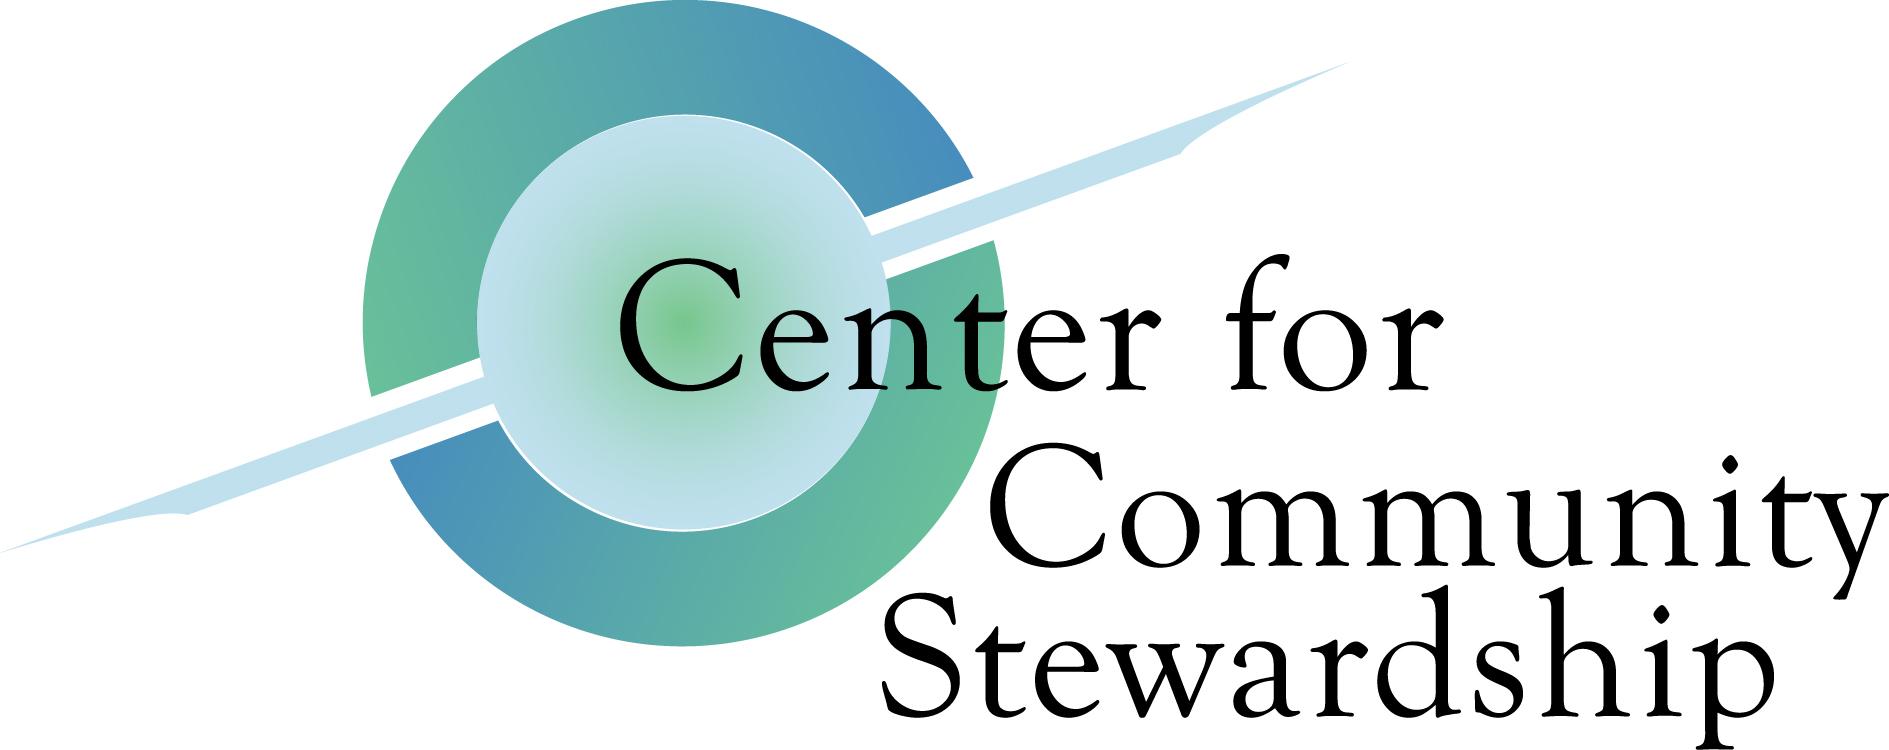 Center for Community Stewardship